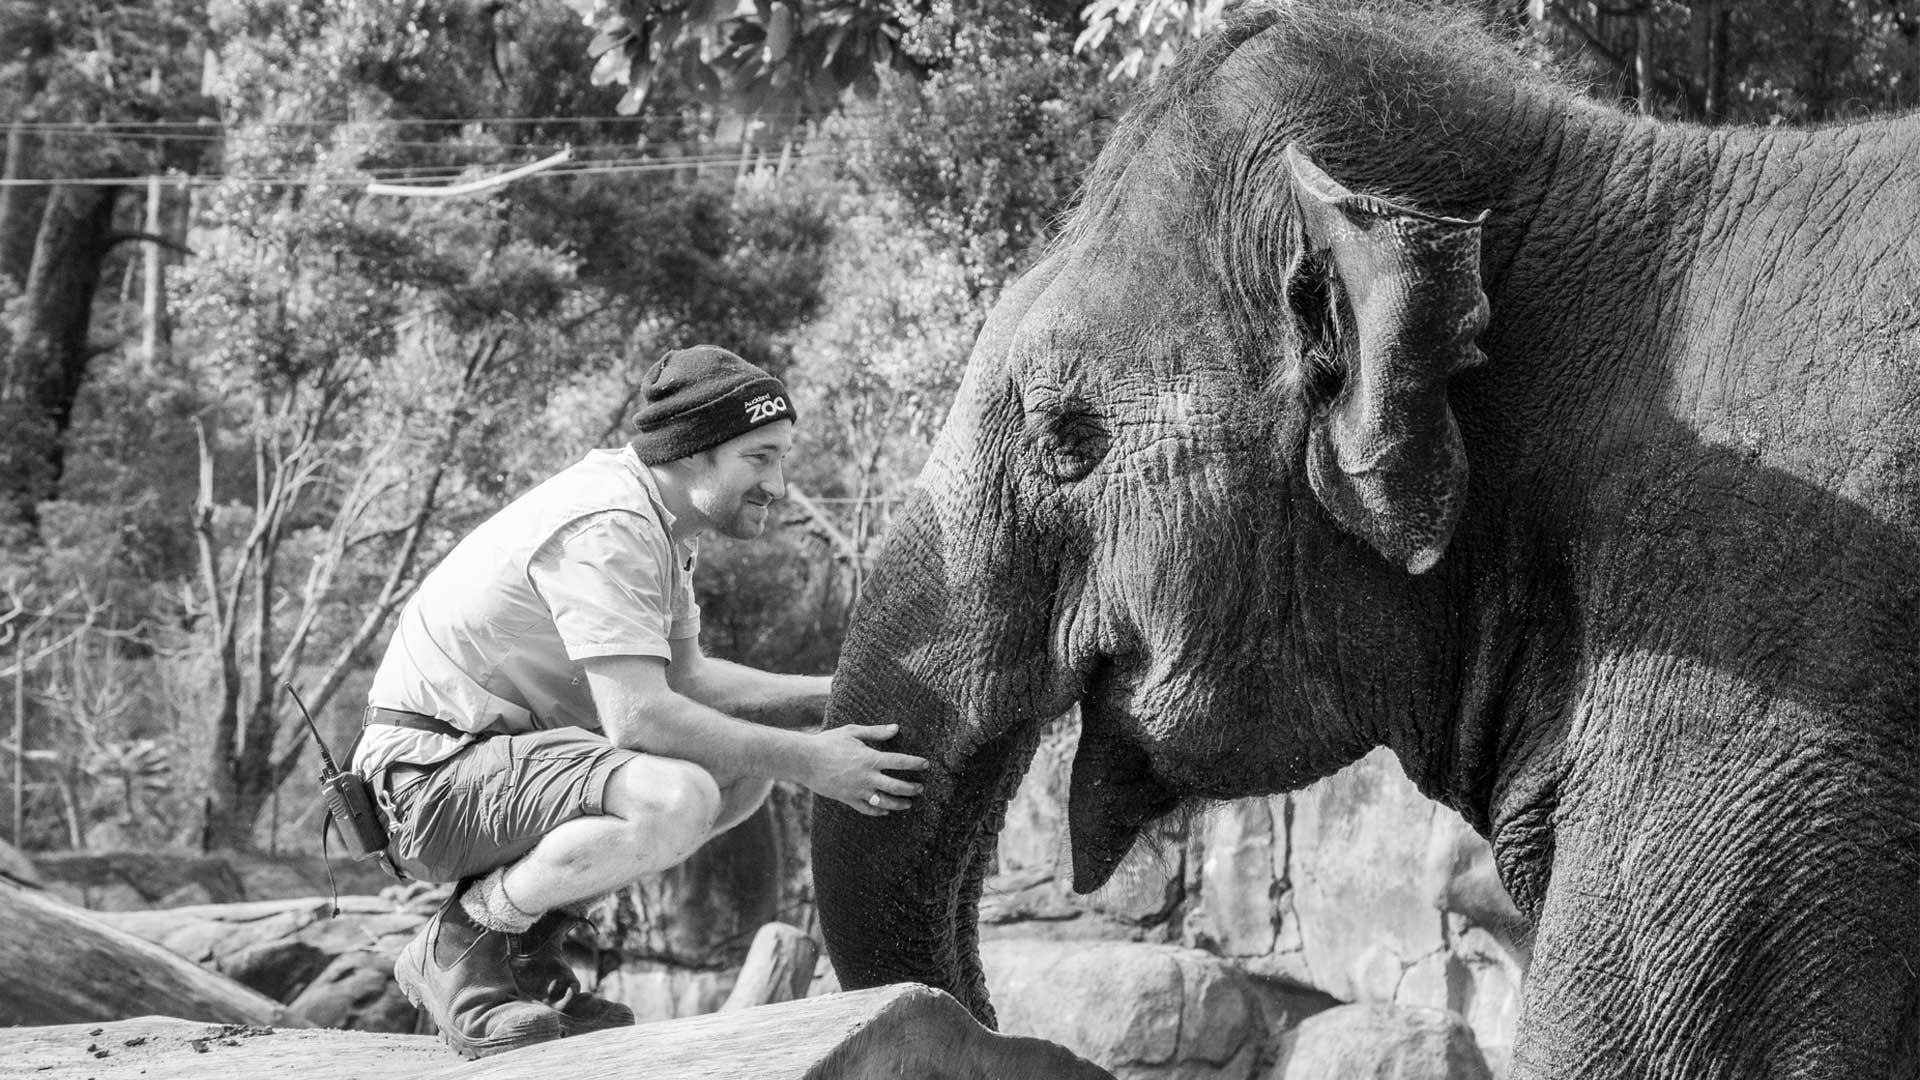 https://rfacdn.nz/zoo/assets/media/world-elephant-day-gallery-9.jpg